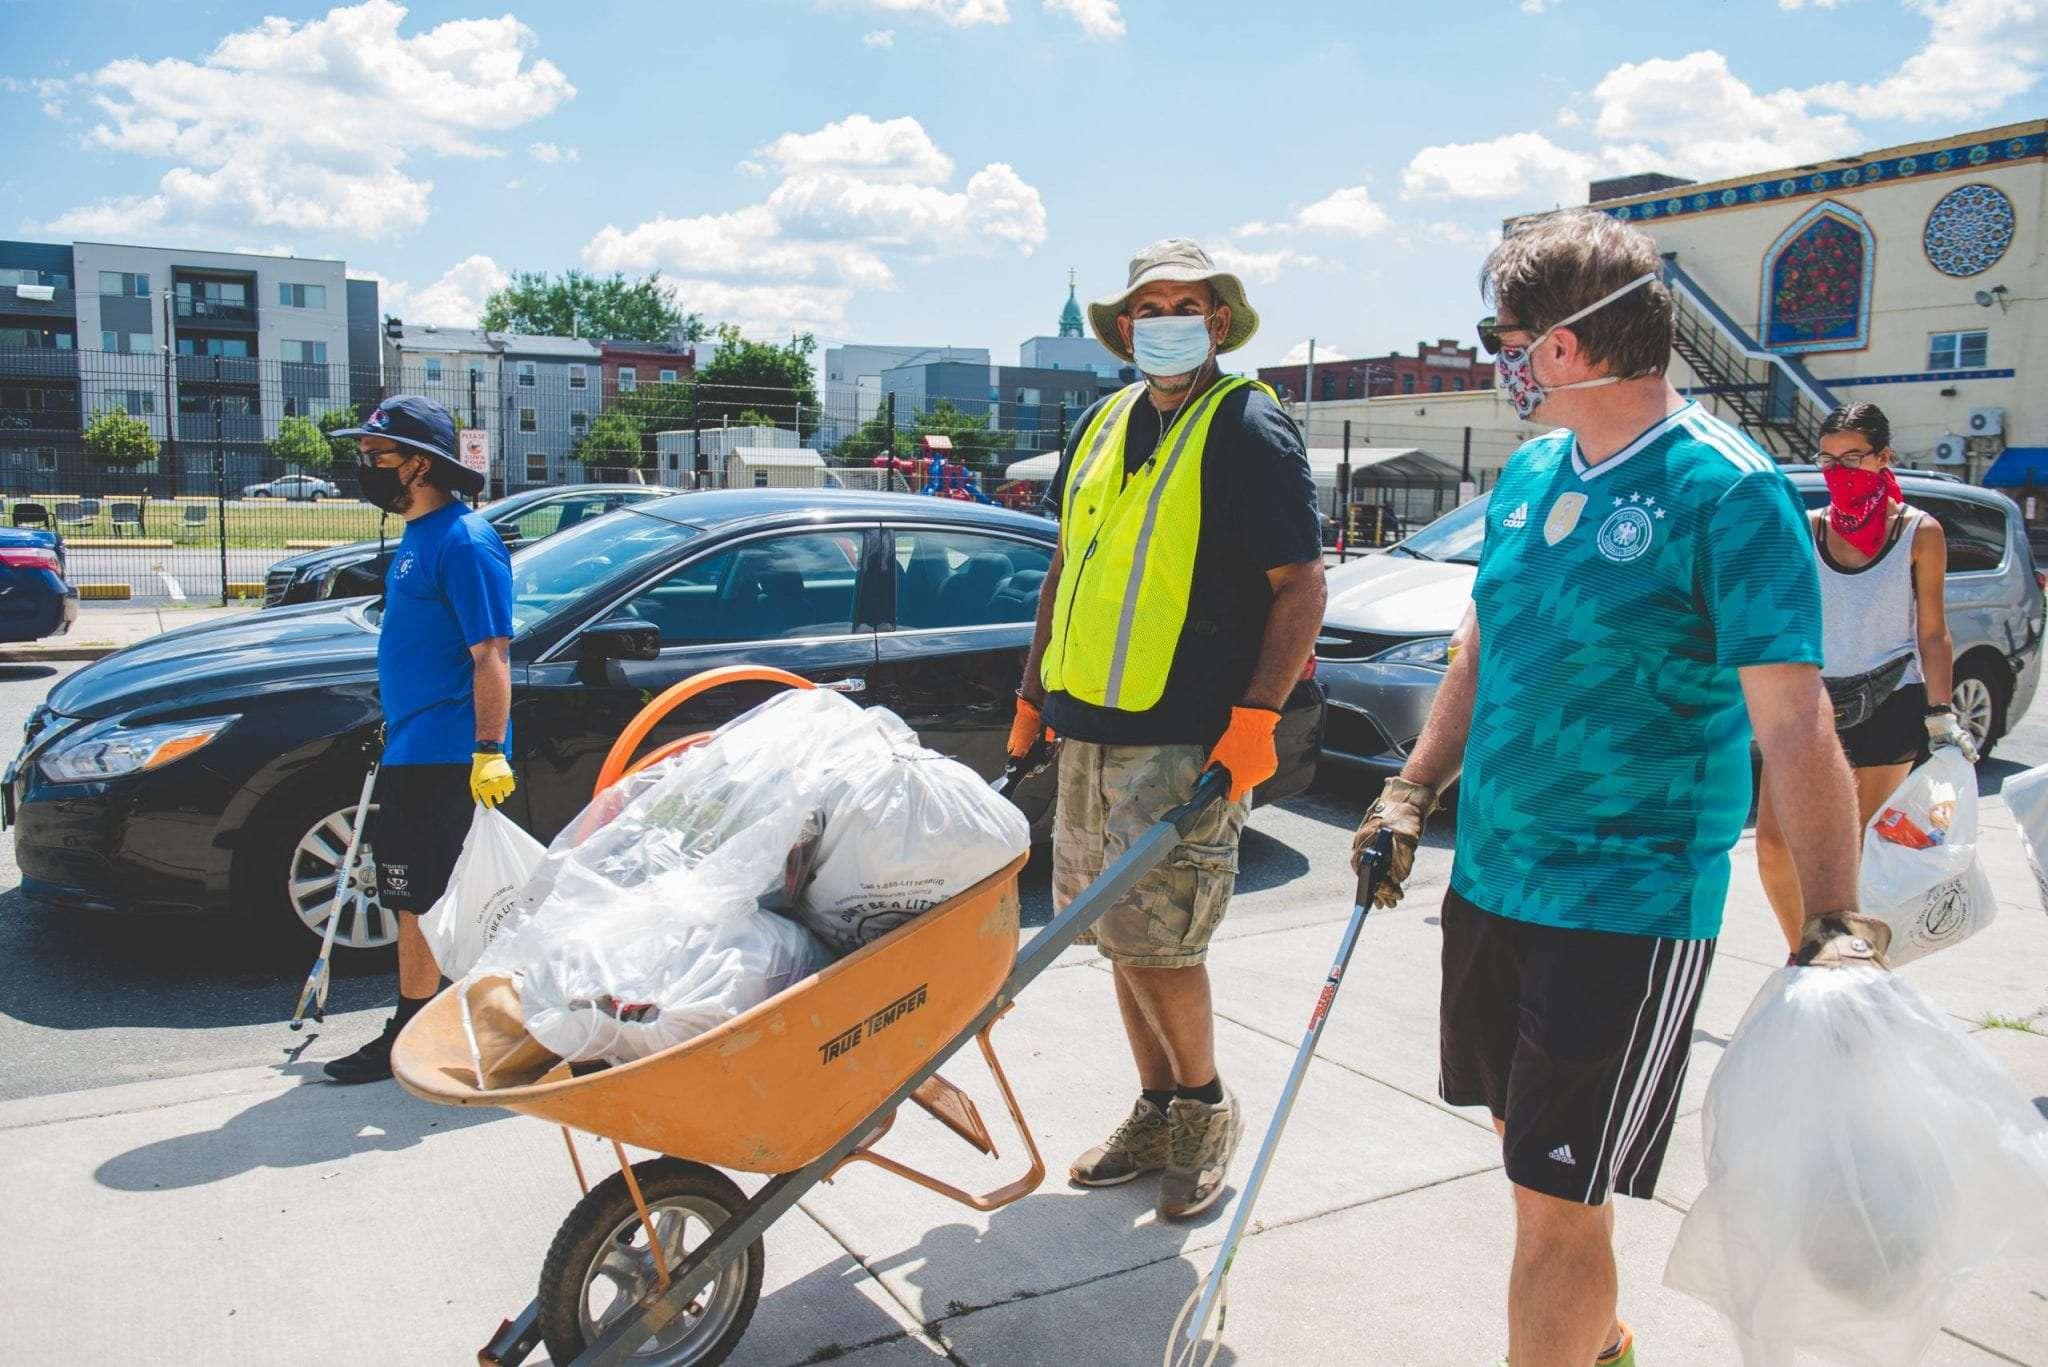 Clean up Philadelphia Sunflower Philly artists Photographer Videographer